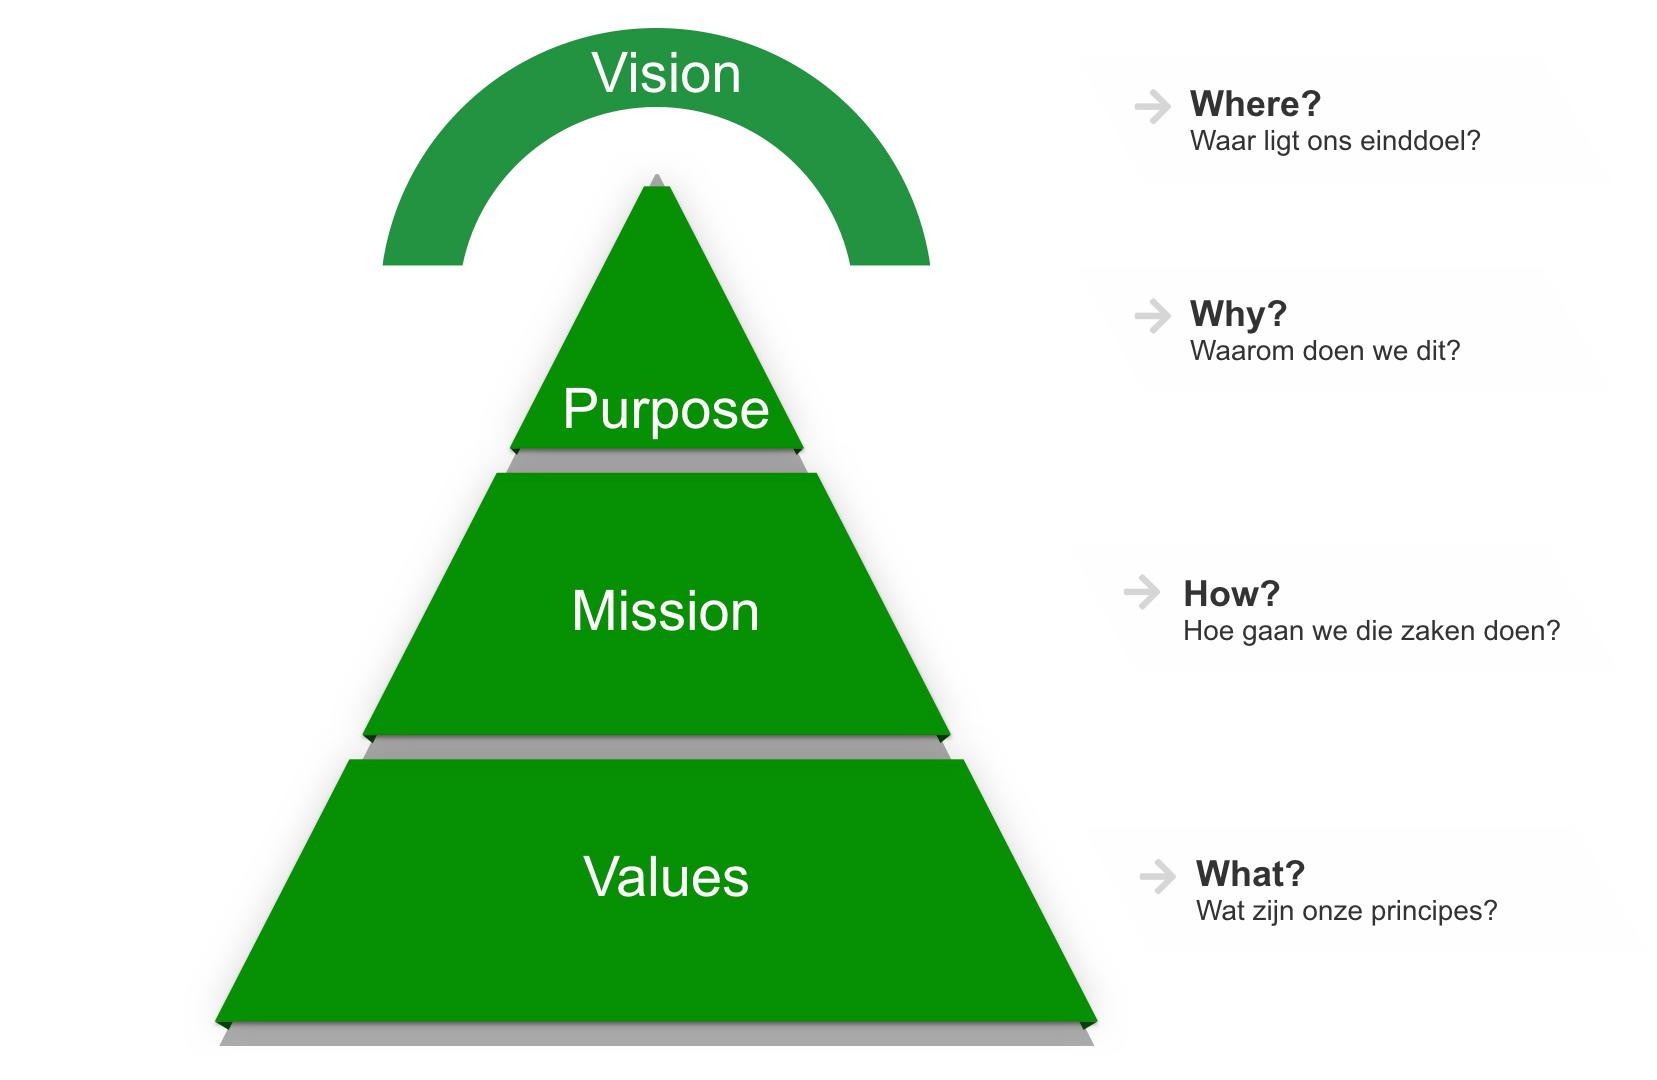 Purpose Pyramide met purpose als richtinggever.